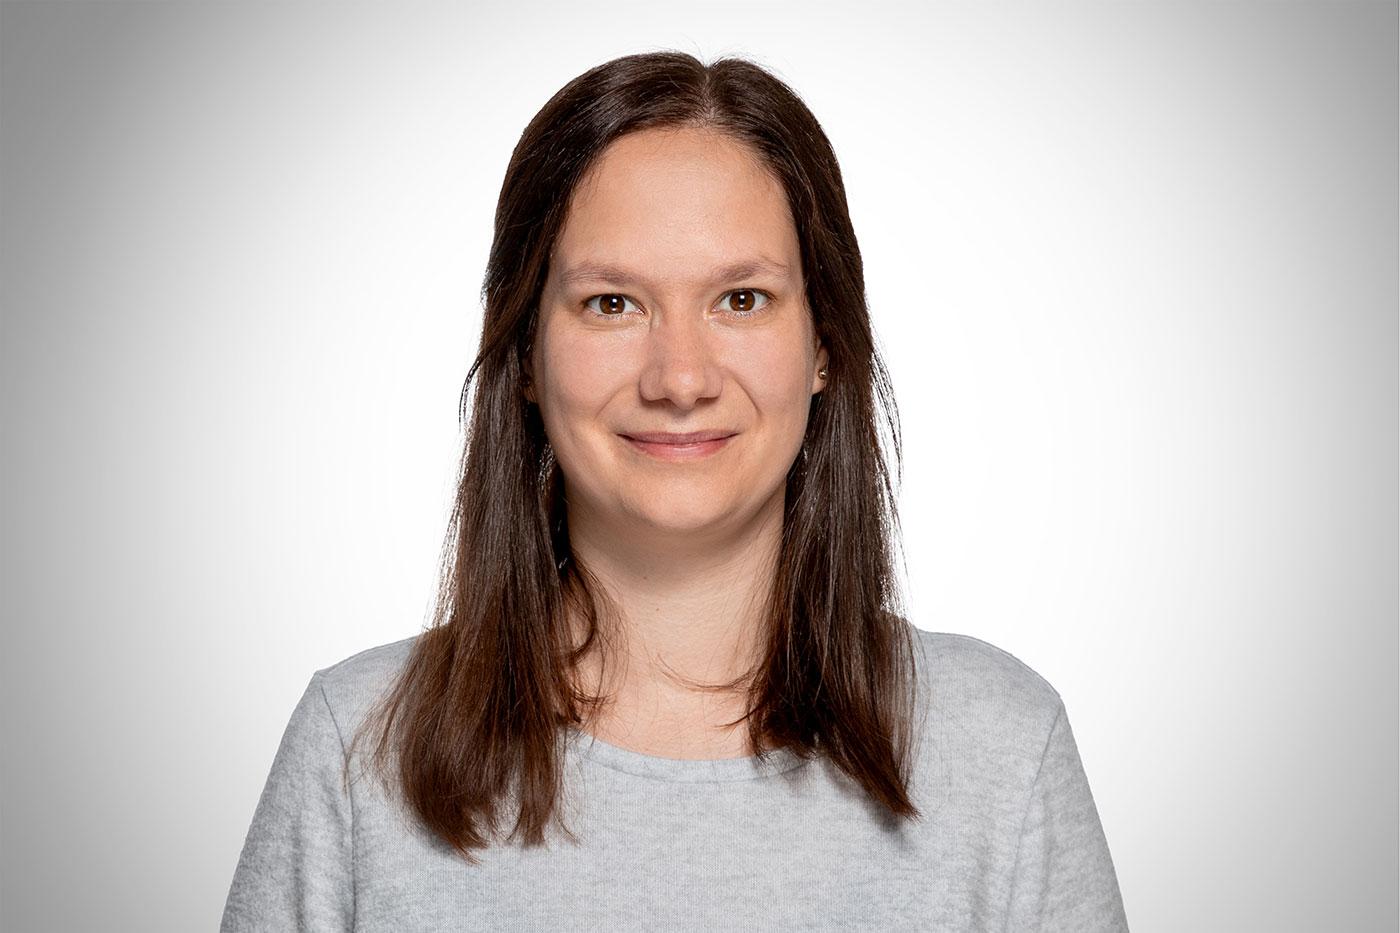 Sabine Grell